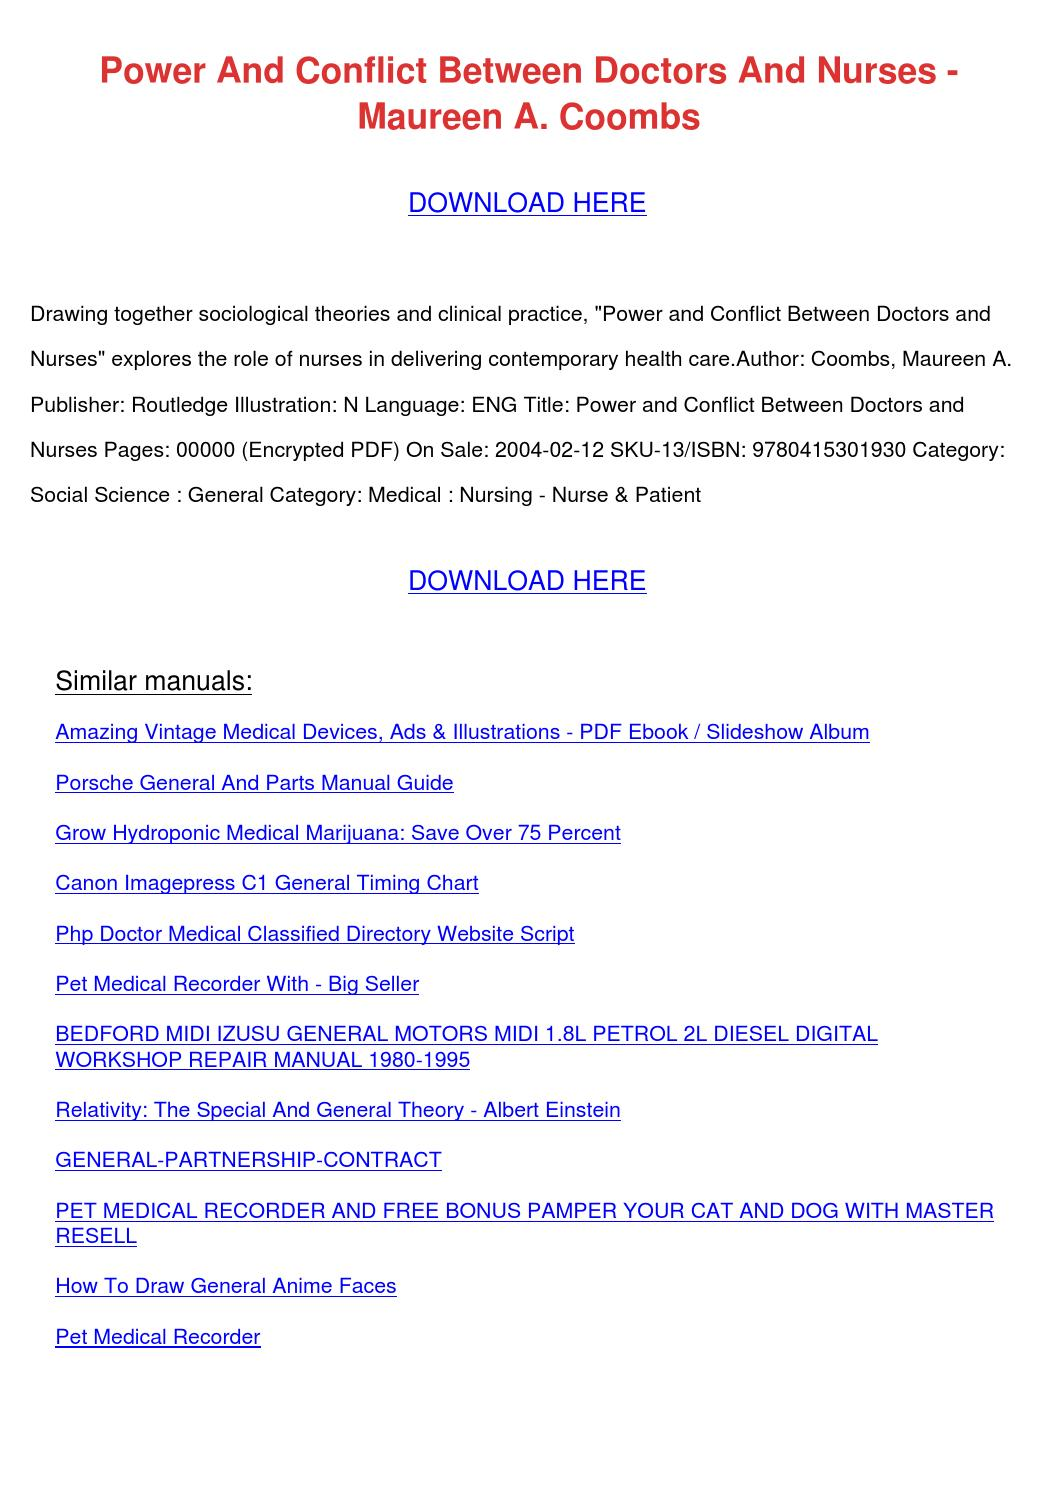 amazing 72 science workshop manual pdf